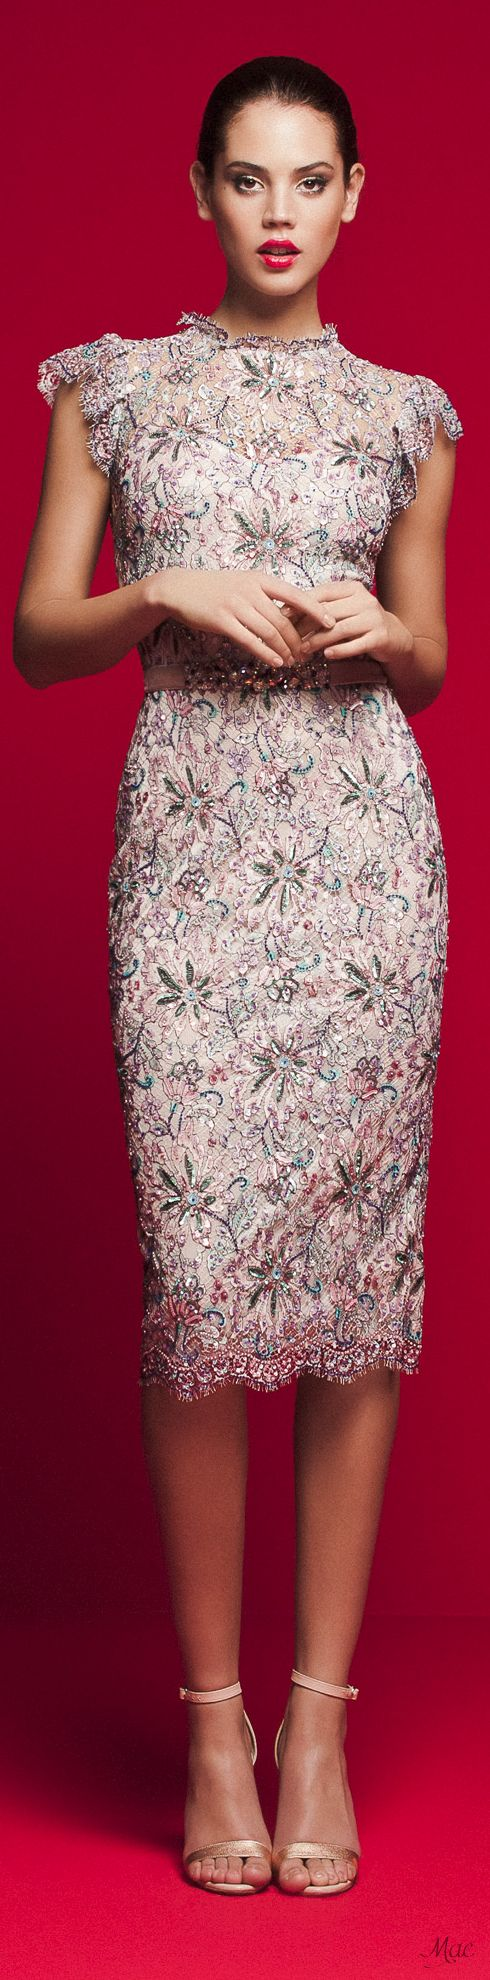 Ronald joyce lace wedding dress september 2018  best Moda images on Pinterest  Feminine fashion For women and